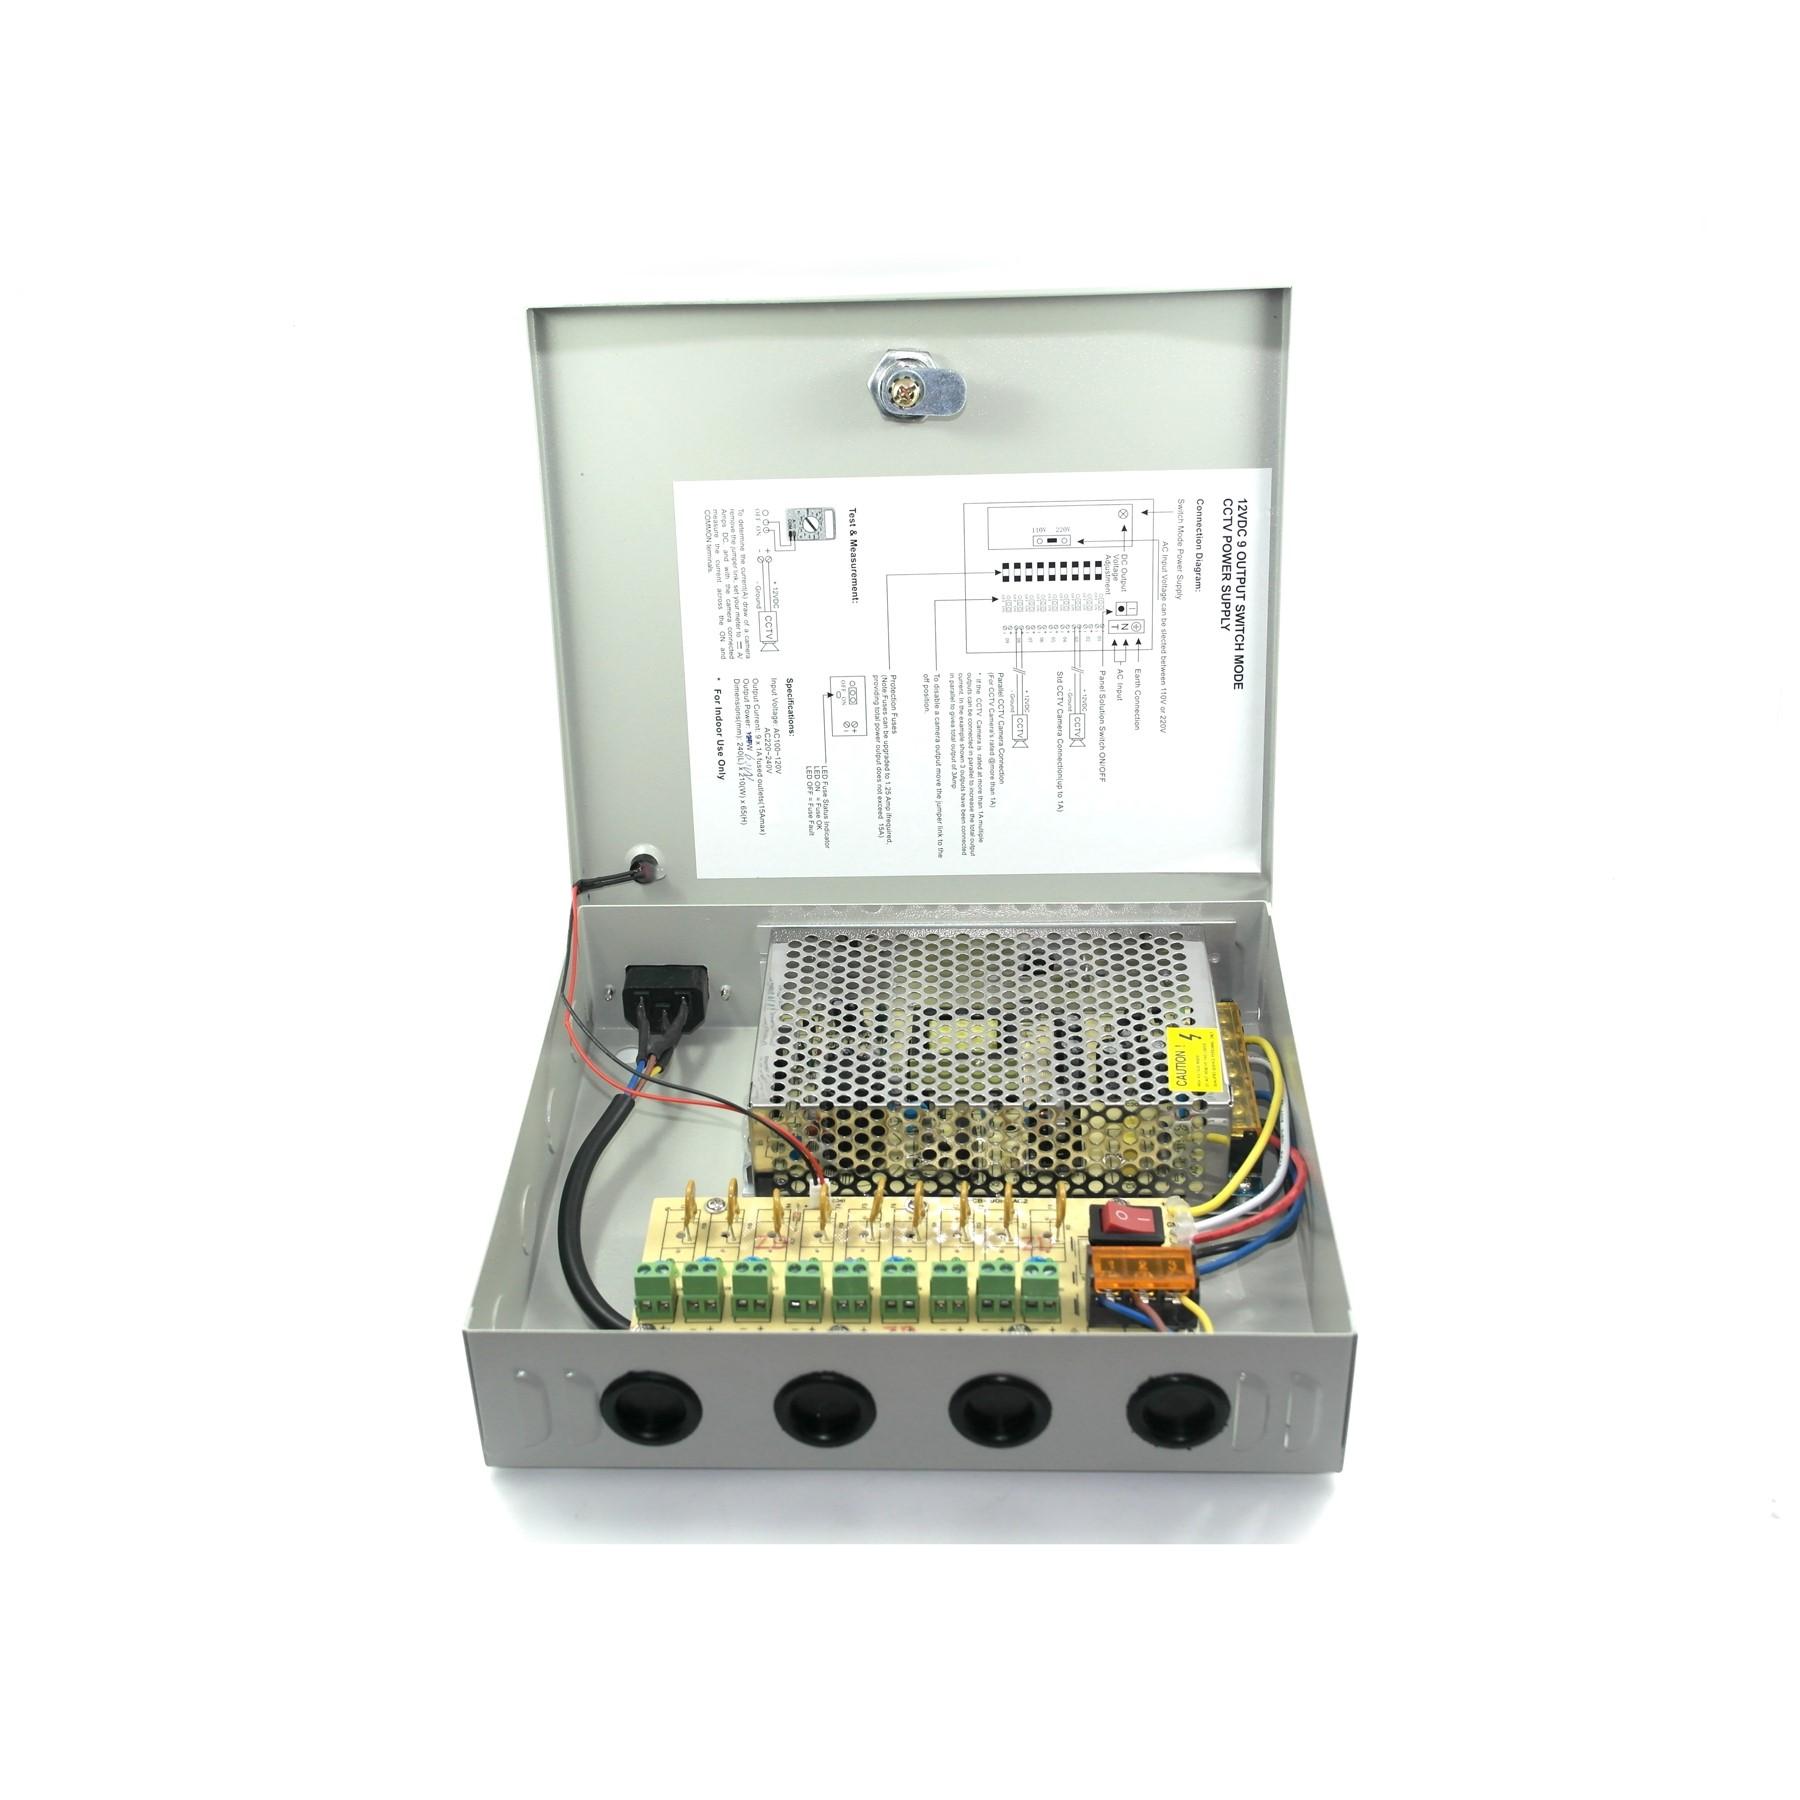 Cctv Power Supply 60w 12v Wiring Diagram